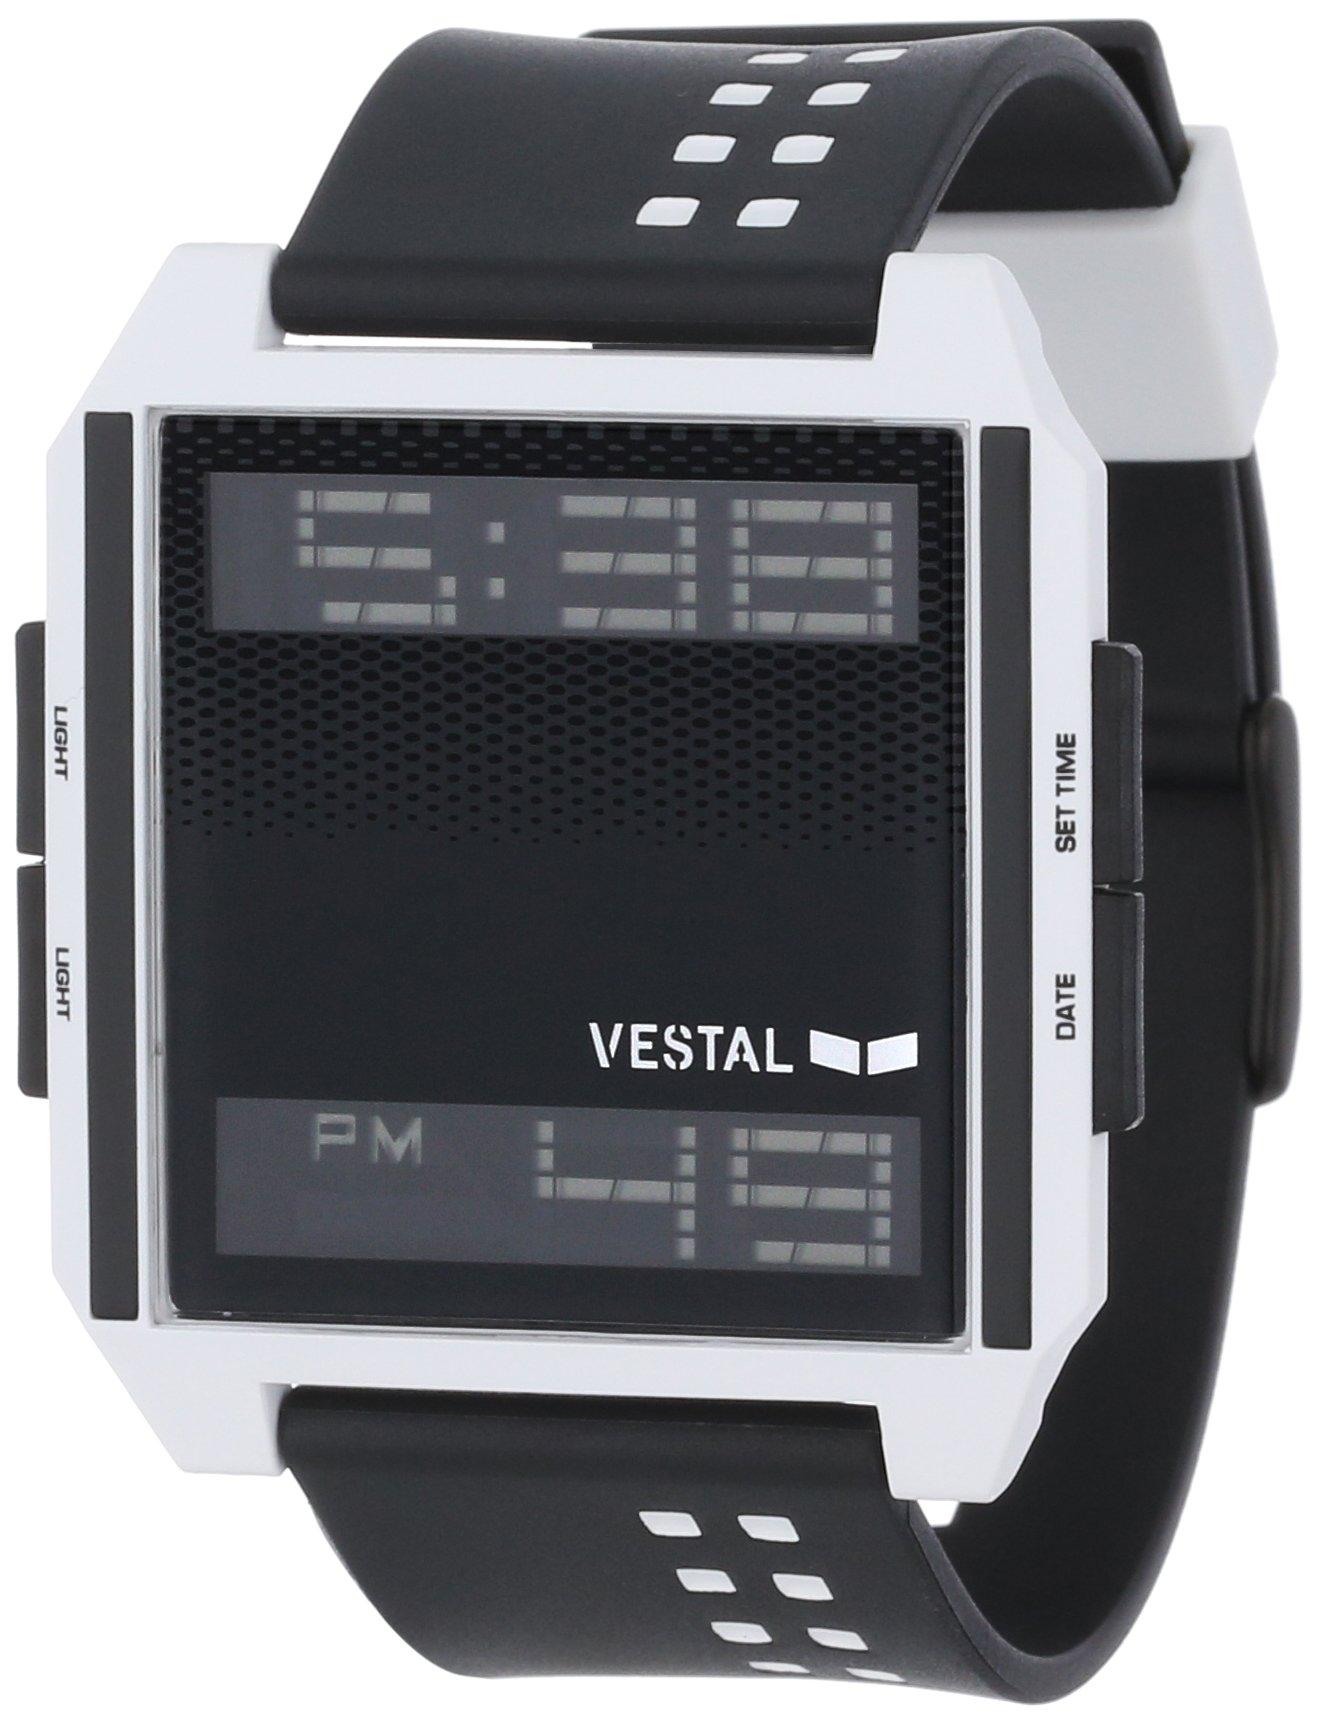 Vestal Men's DIG009 Digichord Black White Polyurethane Digital Watch by Vestal